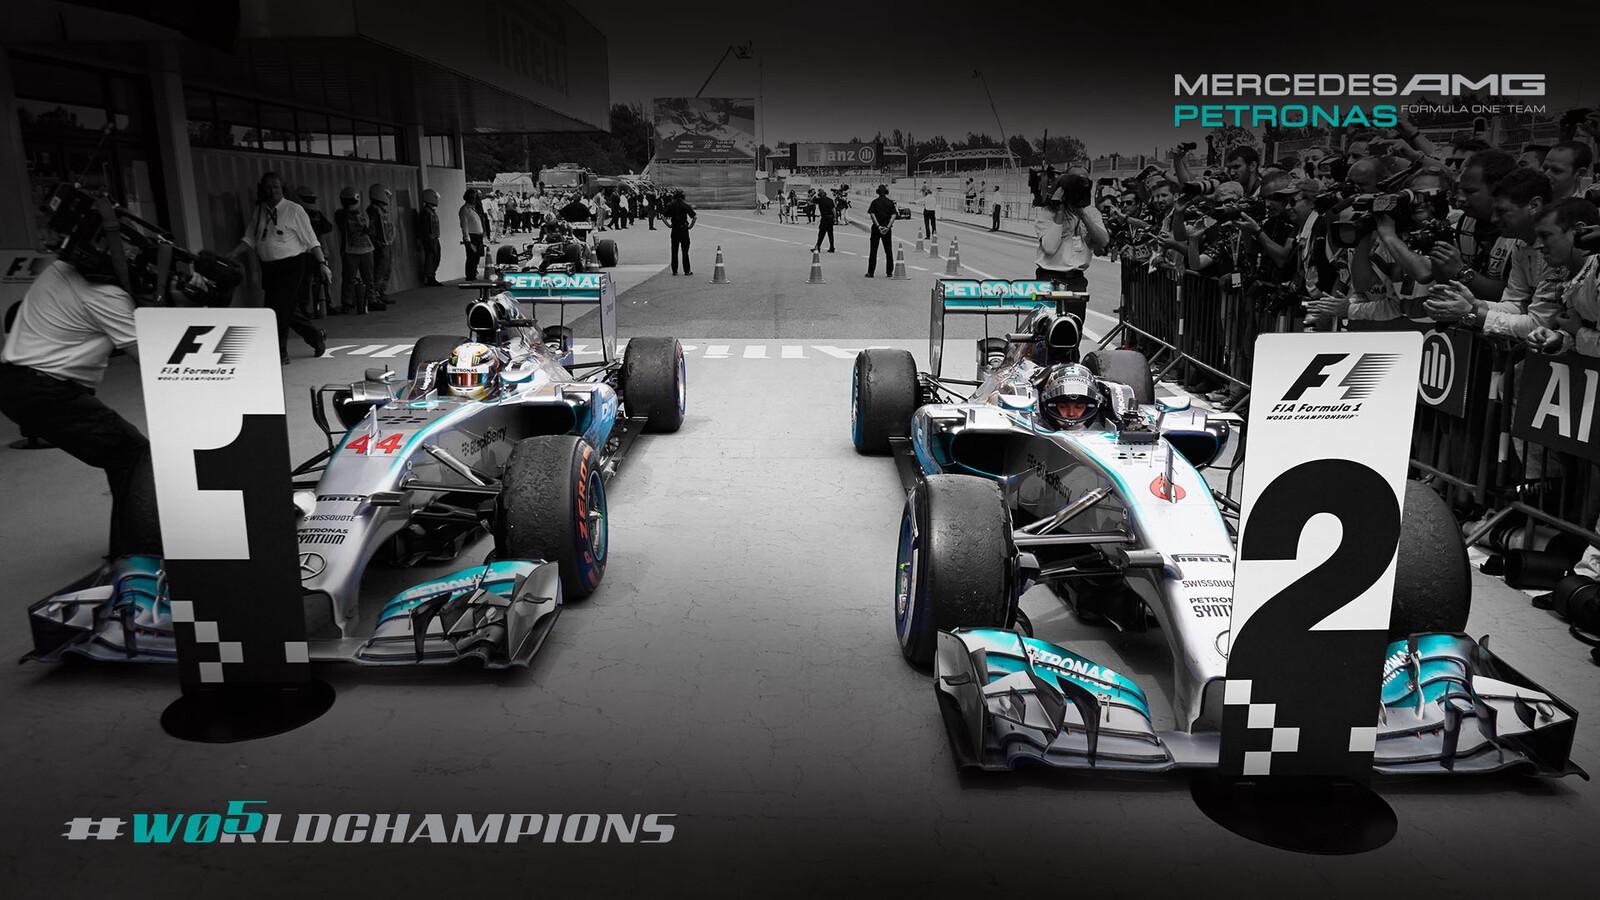 mercedes amg petronas formula one team ends 2014 season on top